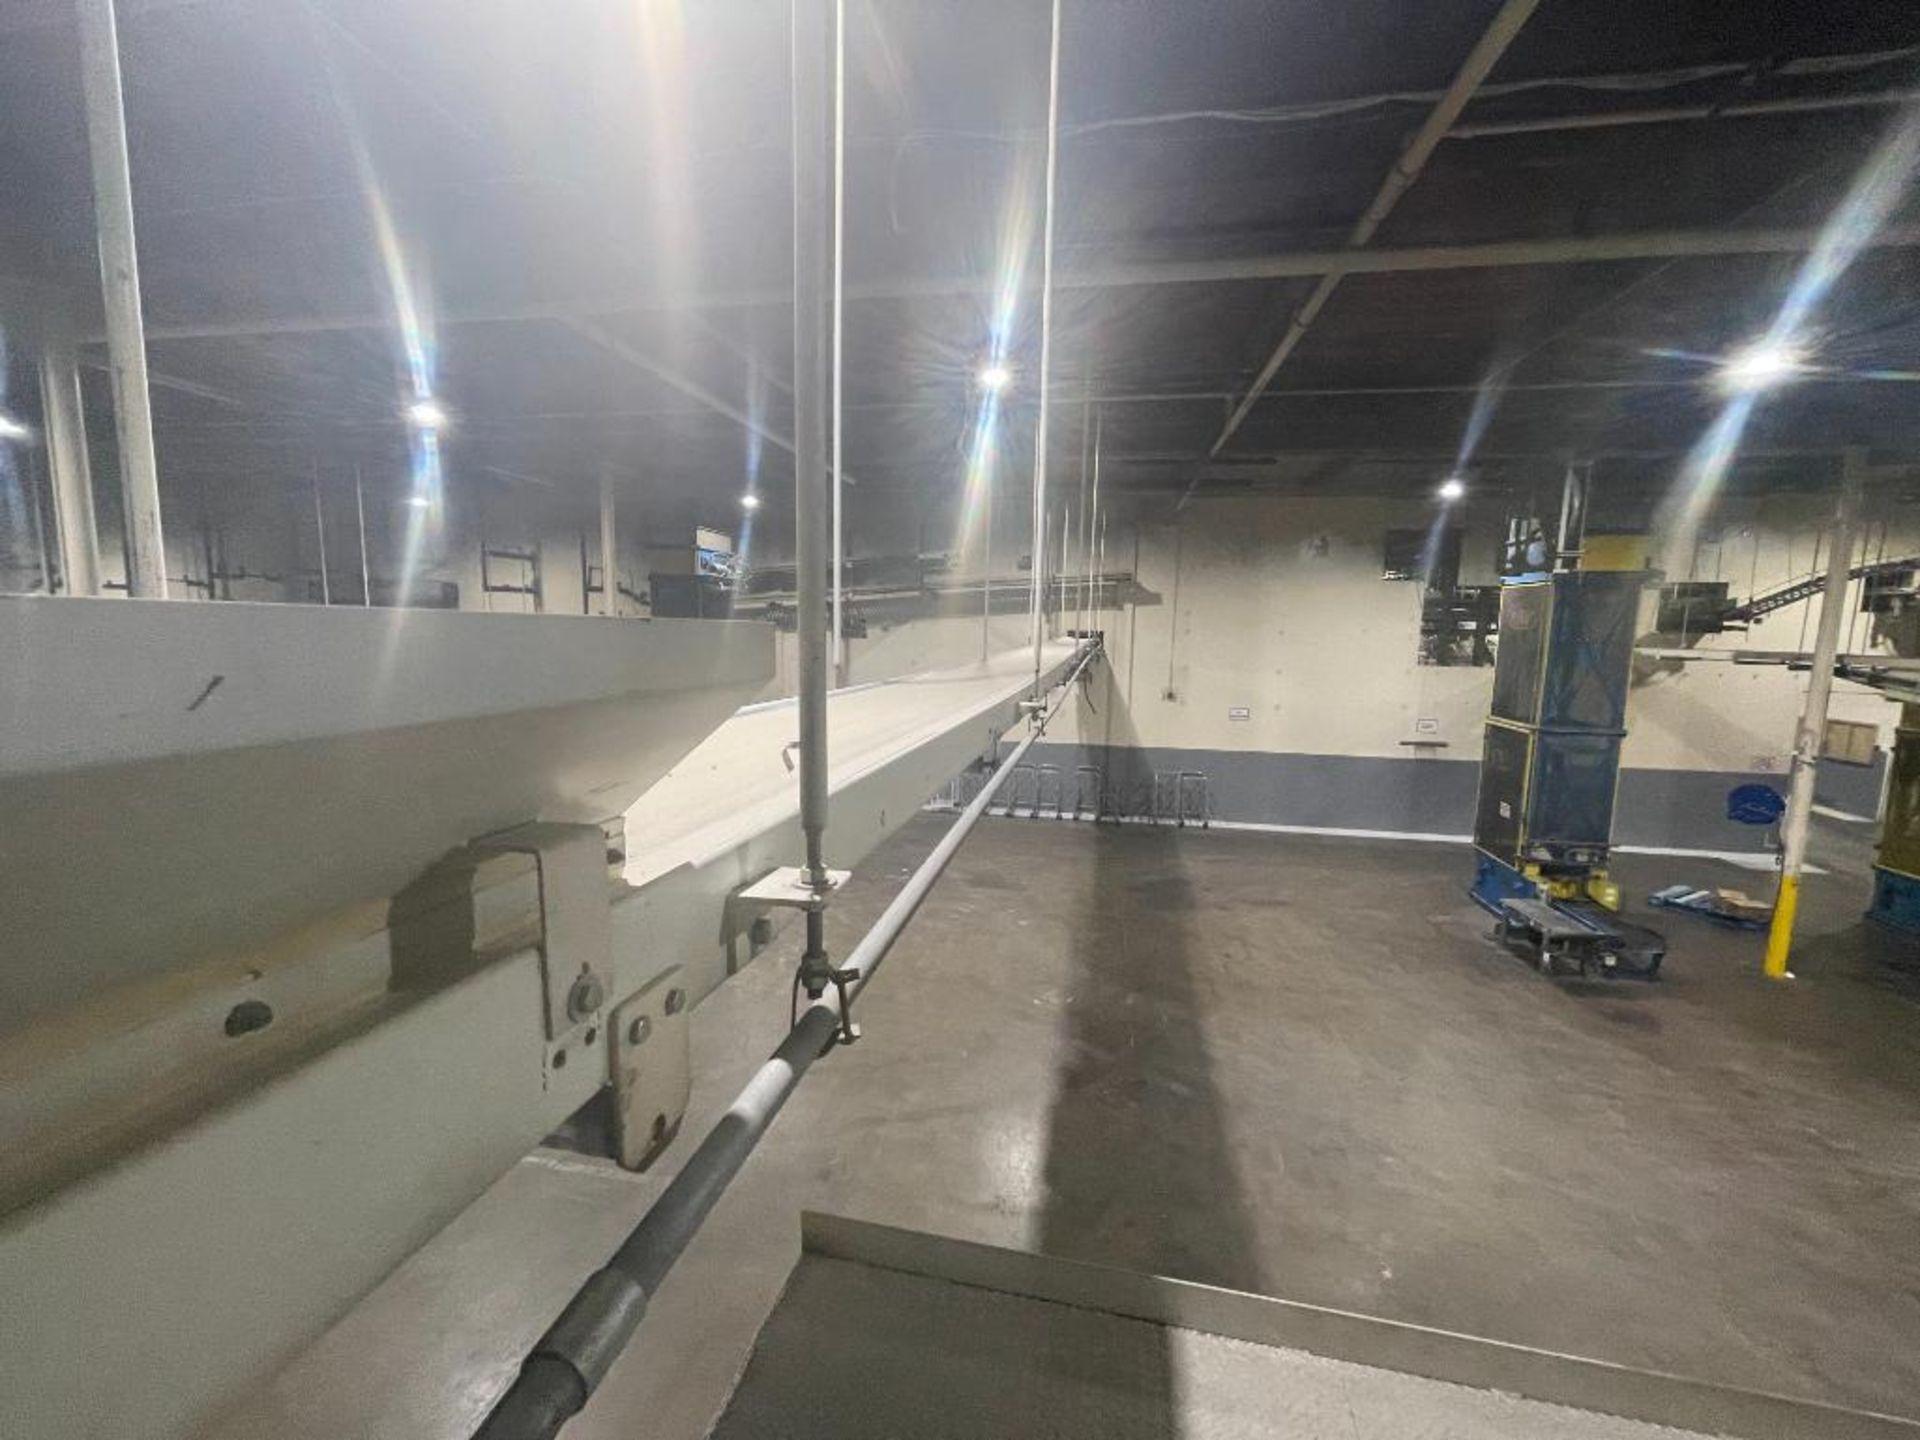 4 Aseeco mild steel conveyors - Image 6 of 14